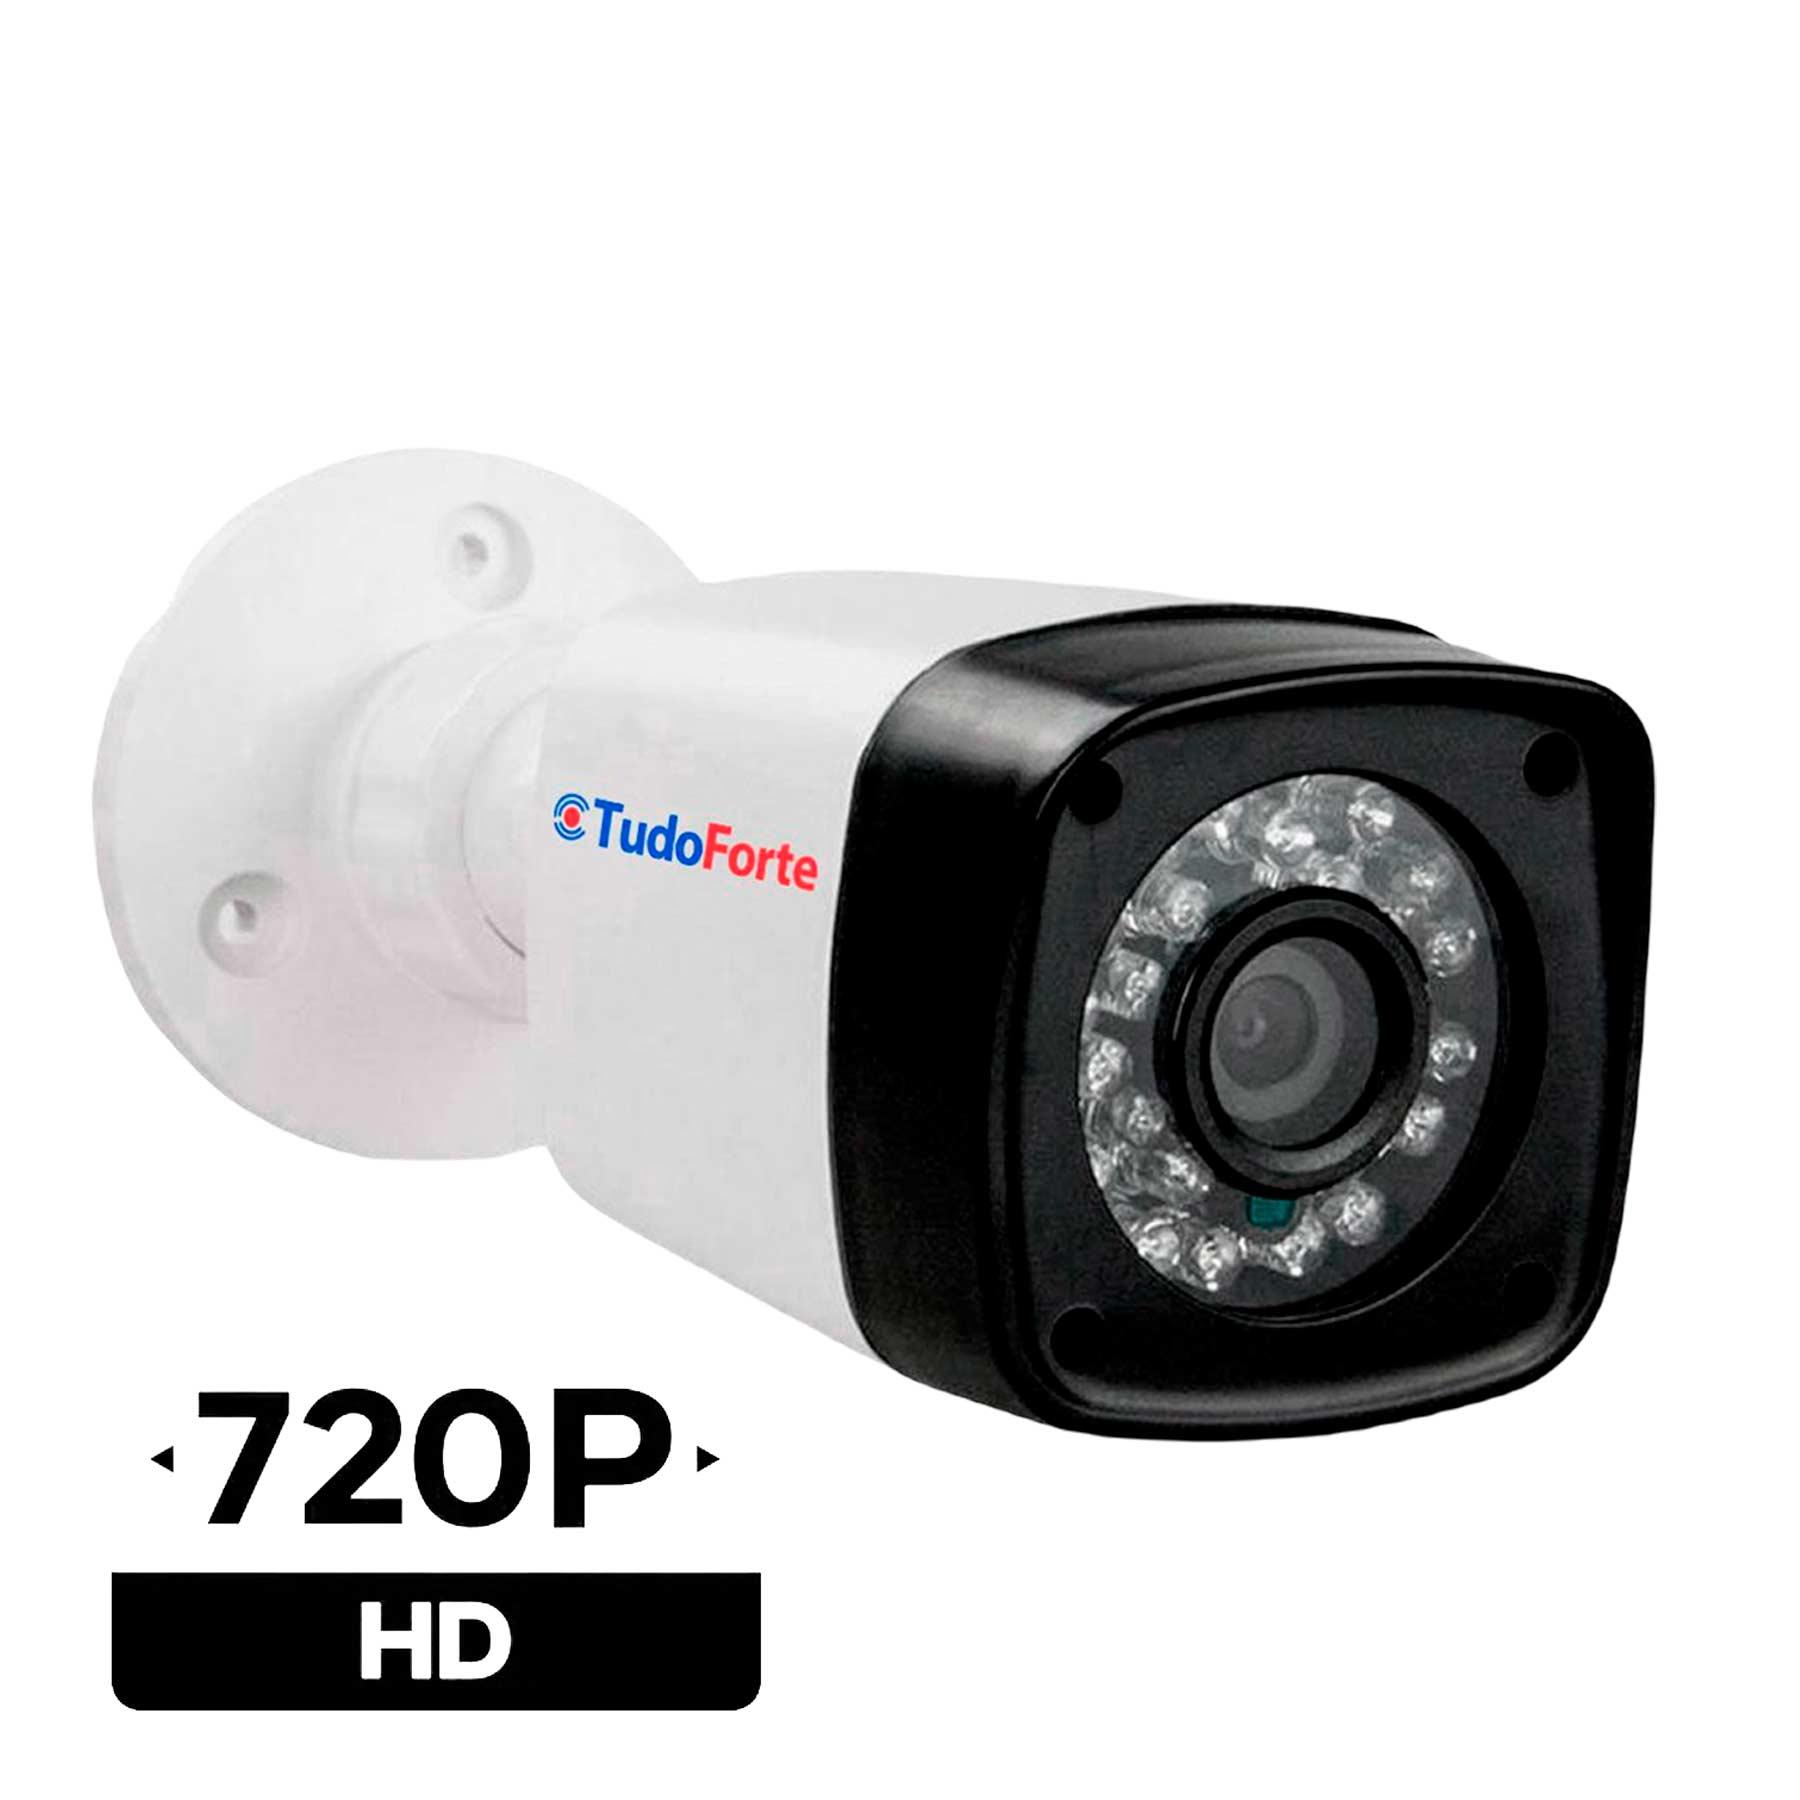 camera-de-seguranca-full-hd-1080p-2mp-bullet-20-metros-infravermelho-tudo-forte